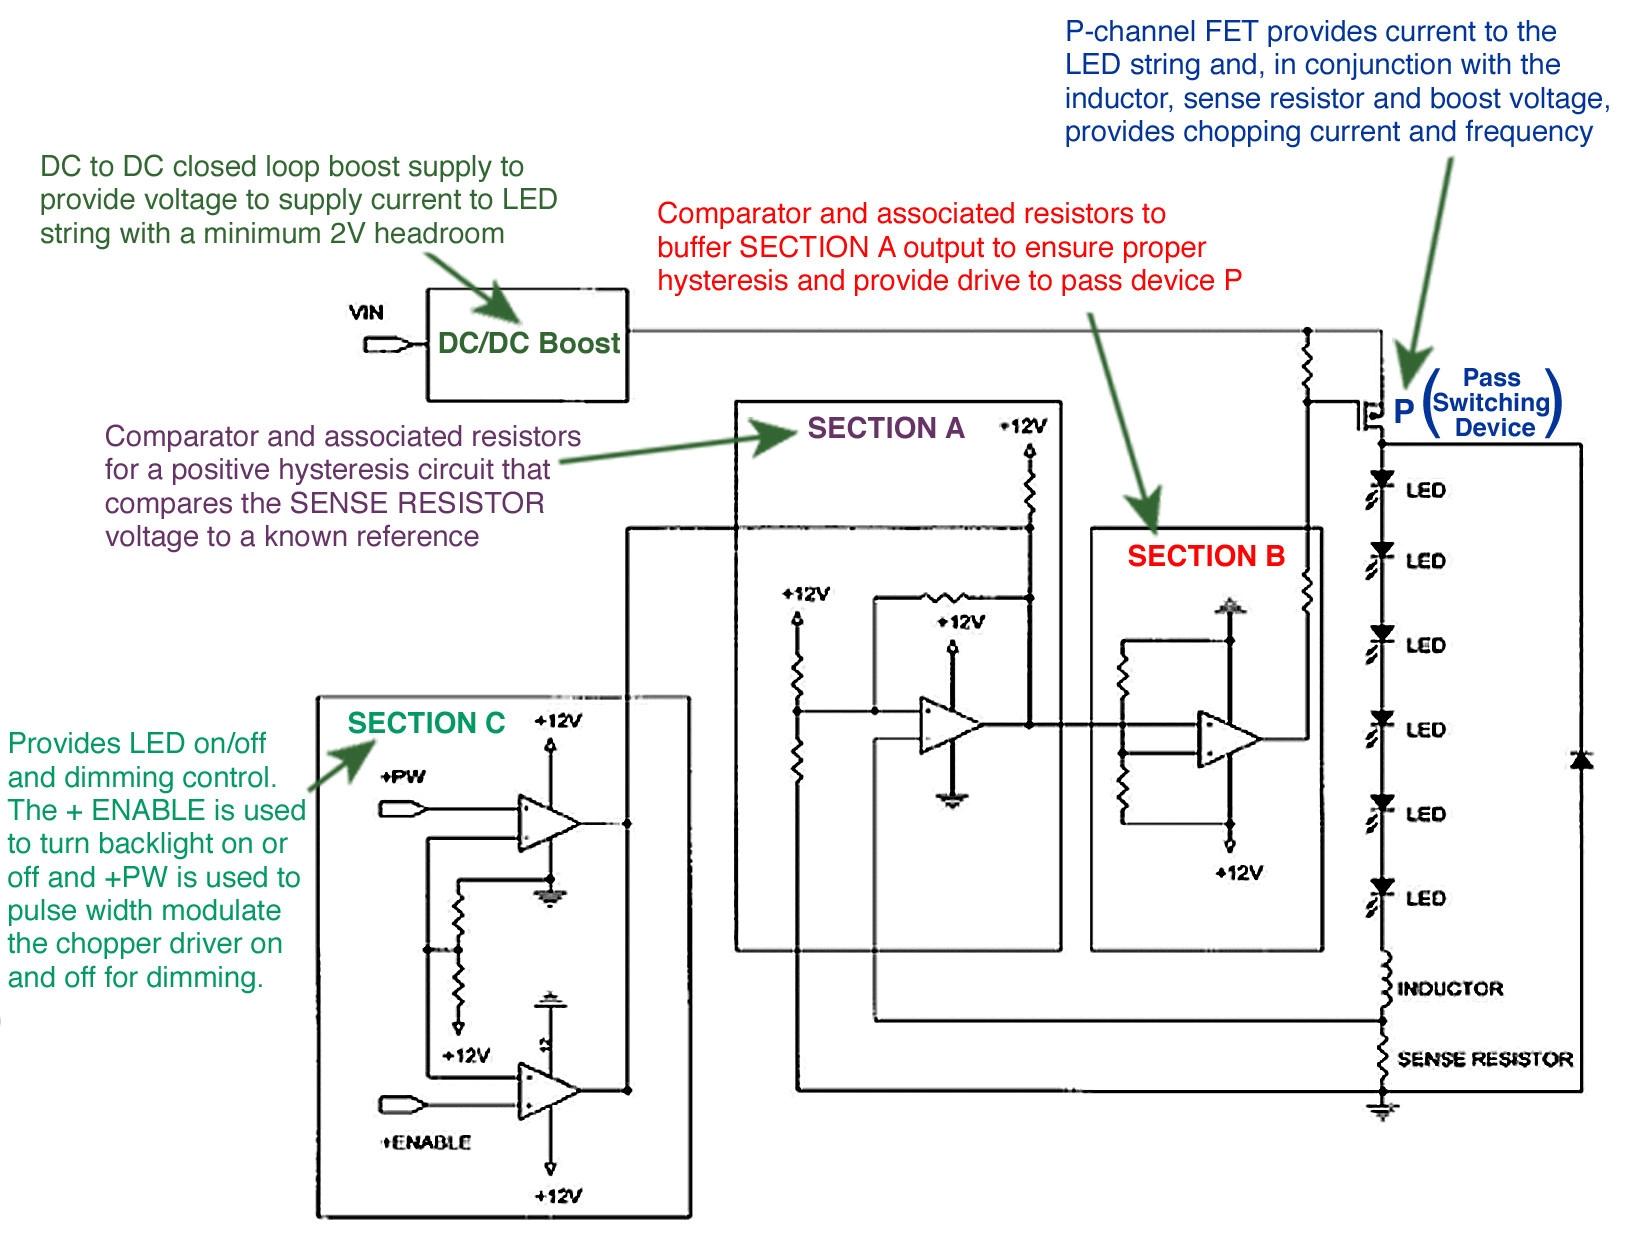 led driver wiring diagram - wiring diagram led driver 2018 constant current led  driver circuit diagram